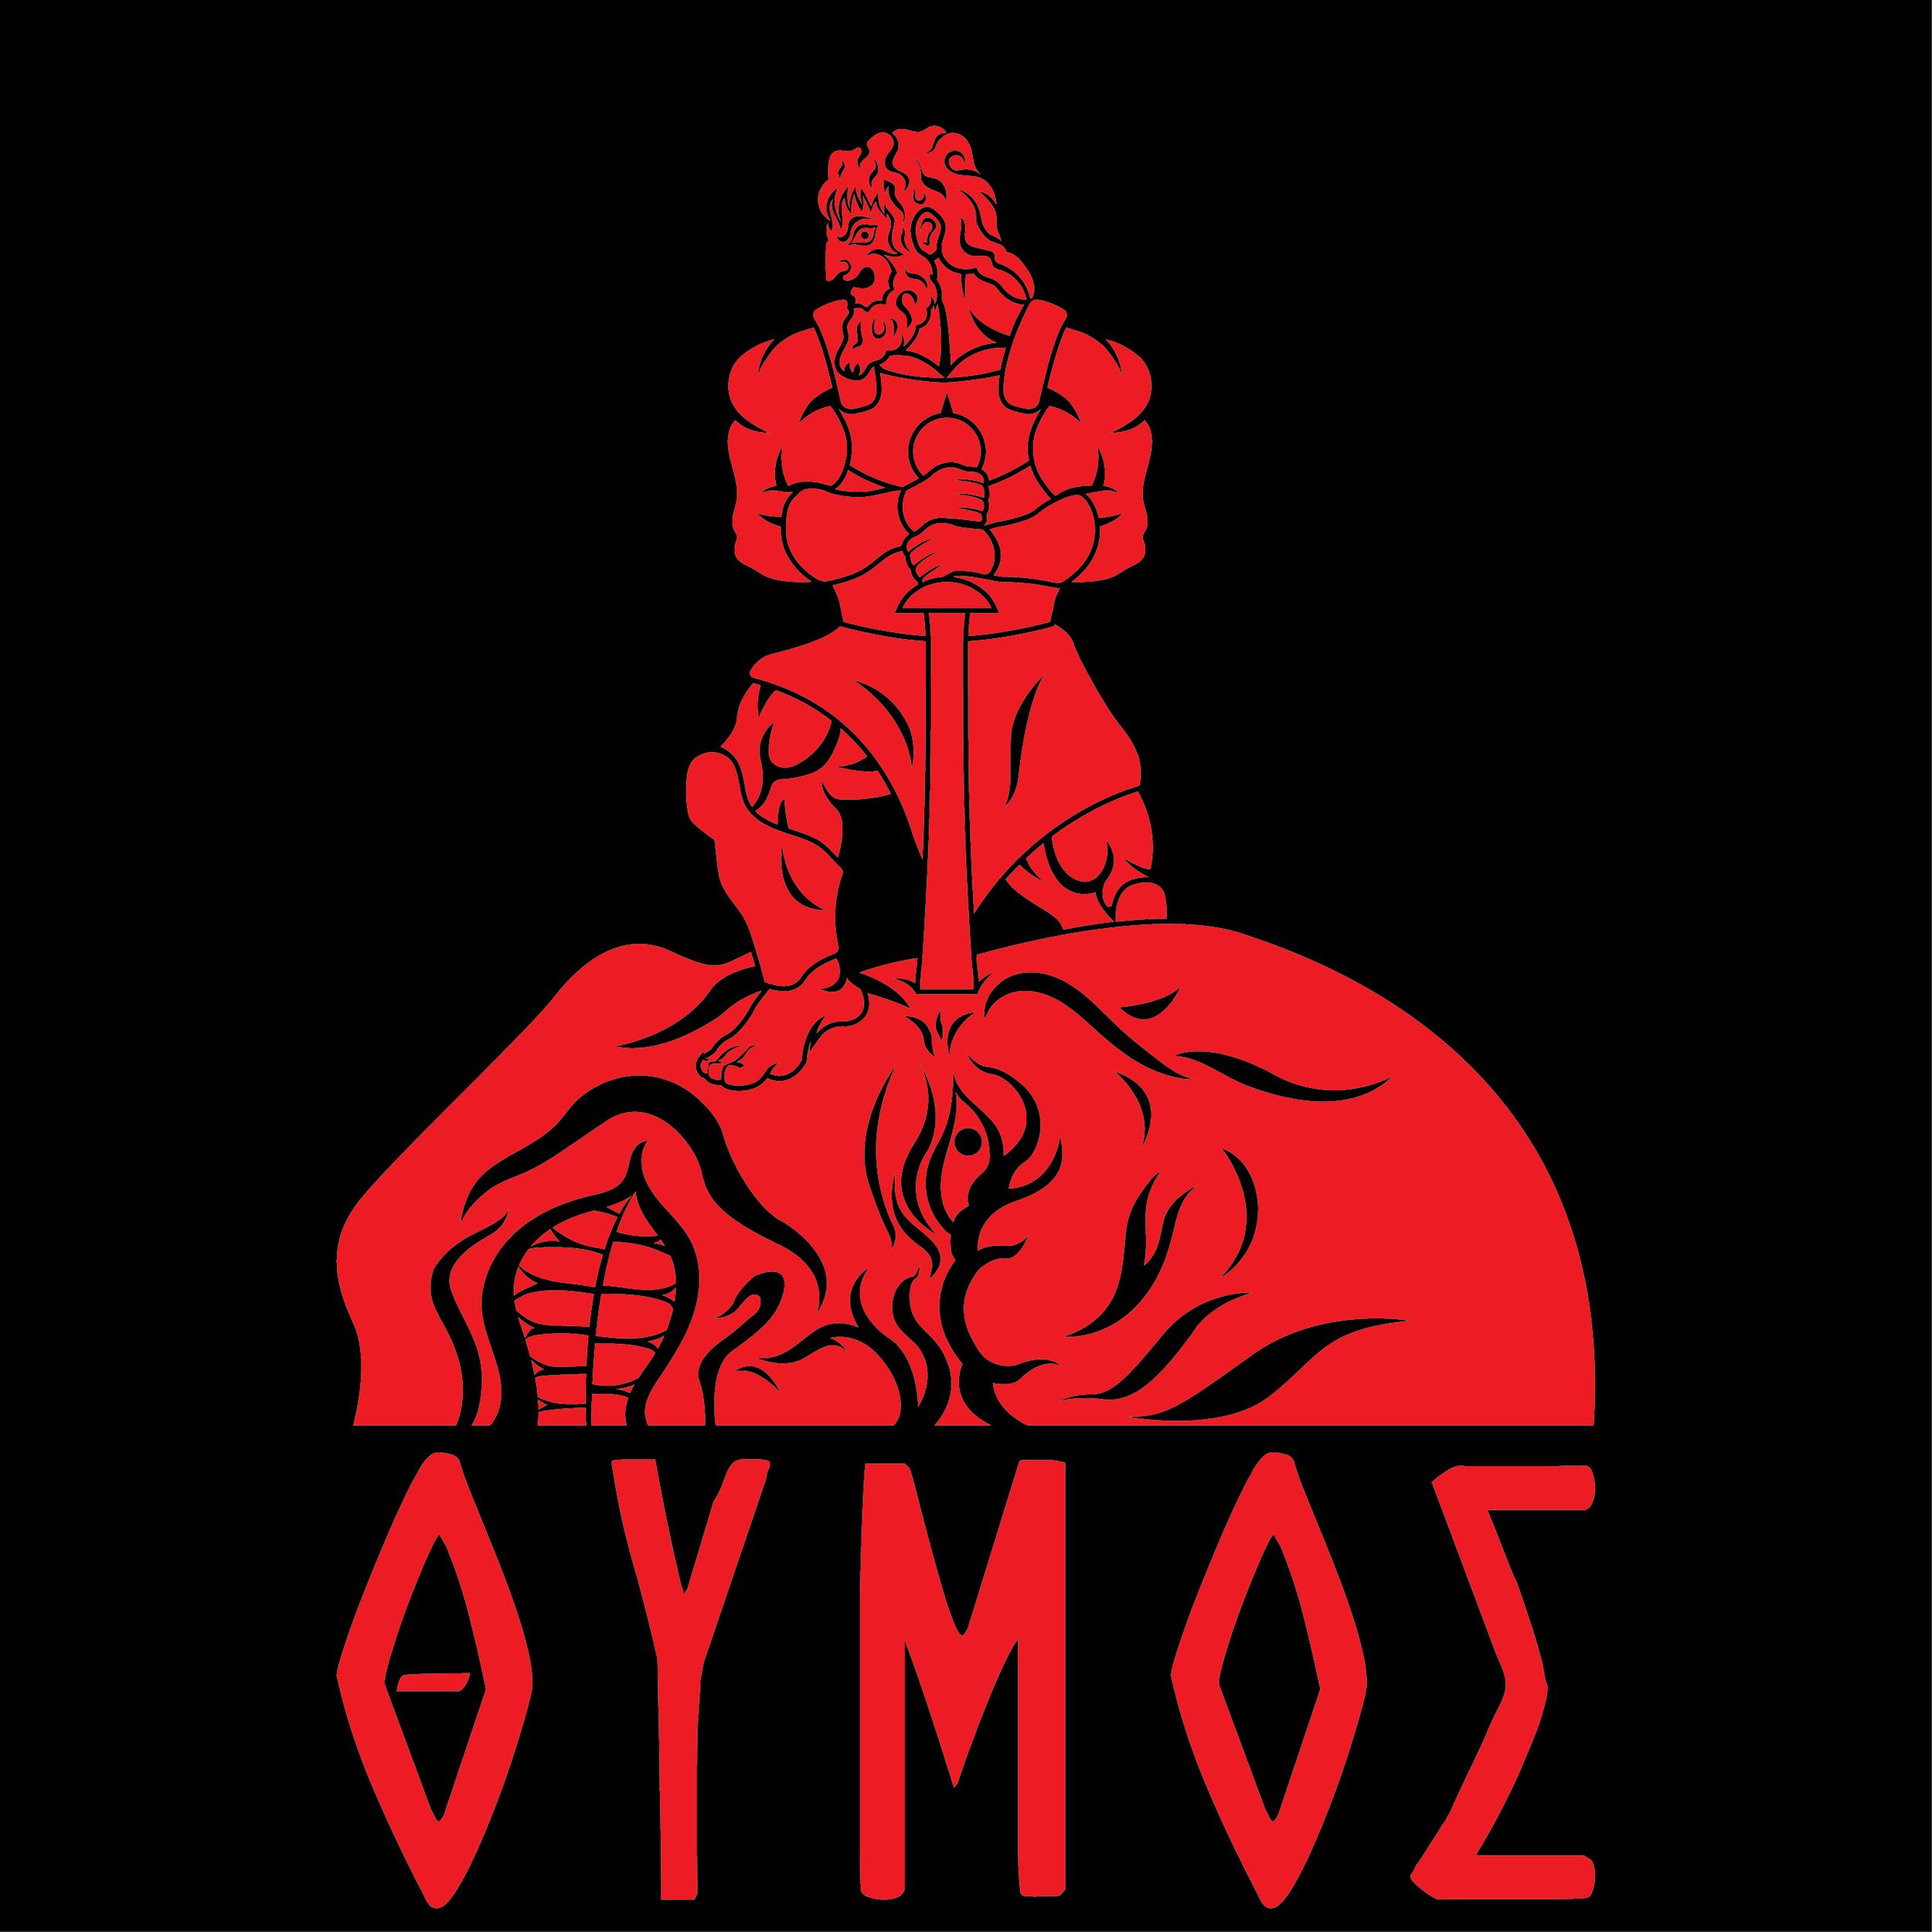 ares-greek-mythos-mythology-rage-power-red-black-god-vs-titan-epic-fight-warrior-godofwar-war-blood-vector-adobe-illustrator-illustration-apparel-design-roberto-artist-orozco-art-omar-isuf-raskol-apparel-lasvegas-vegas-nevada-toronto-canada.jpg